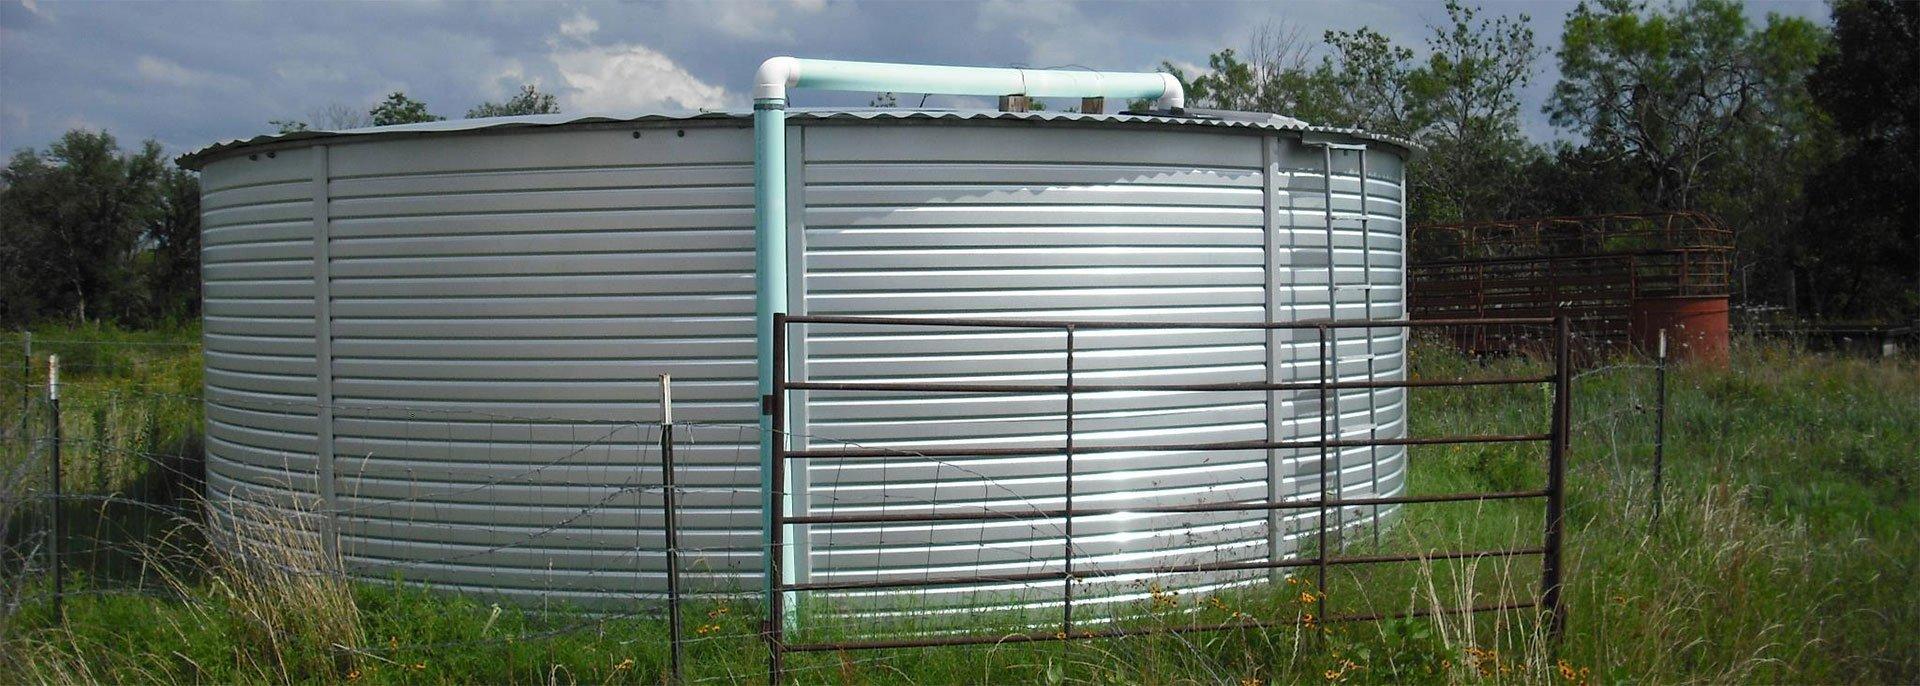 15,000 Gallon water storage tanks Pioneer